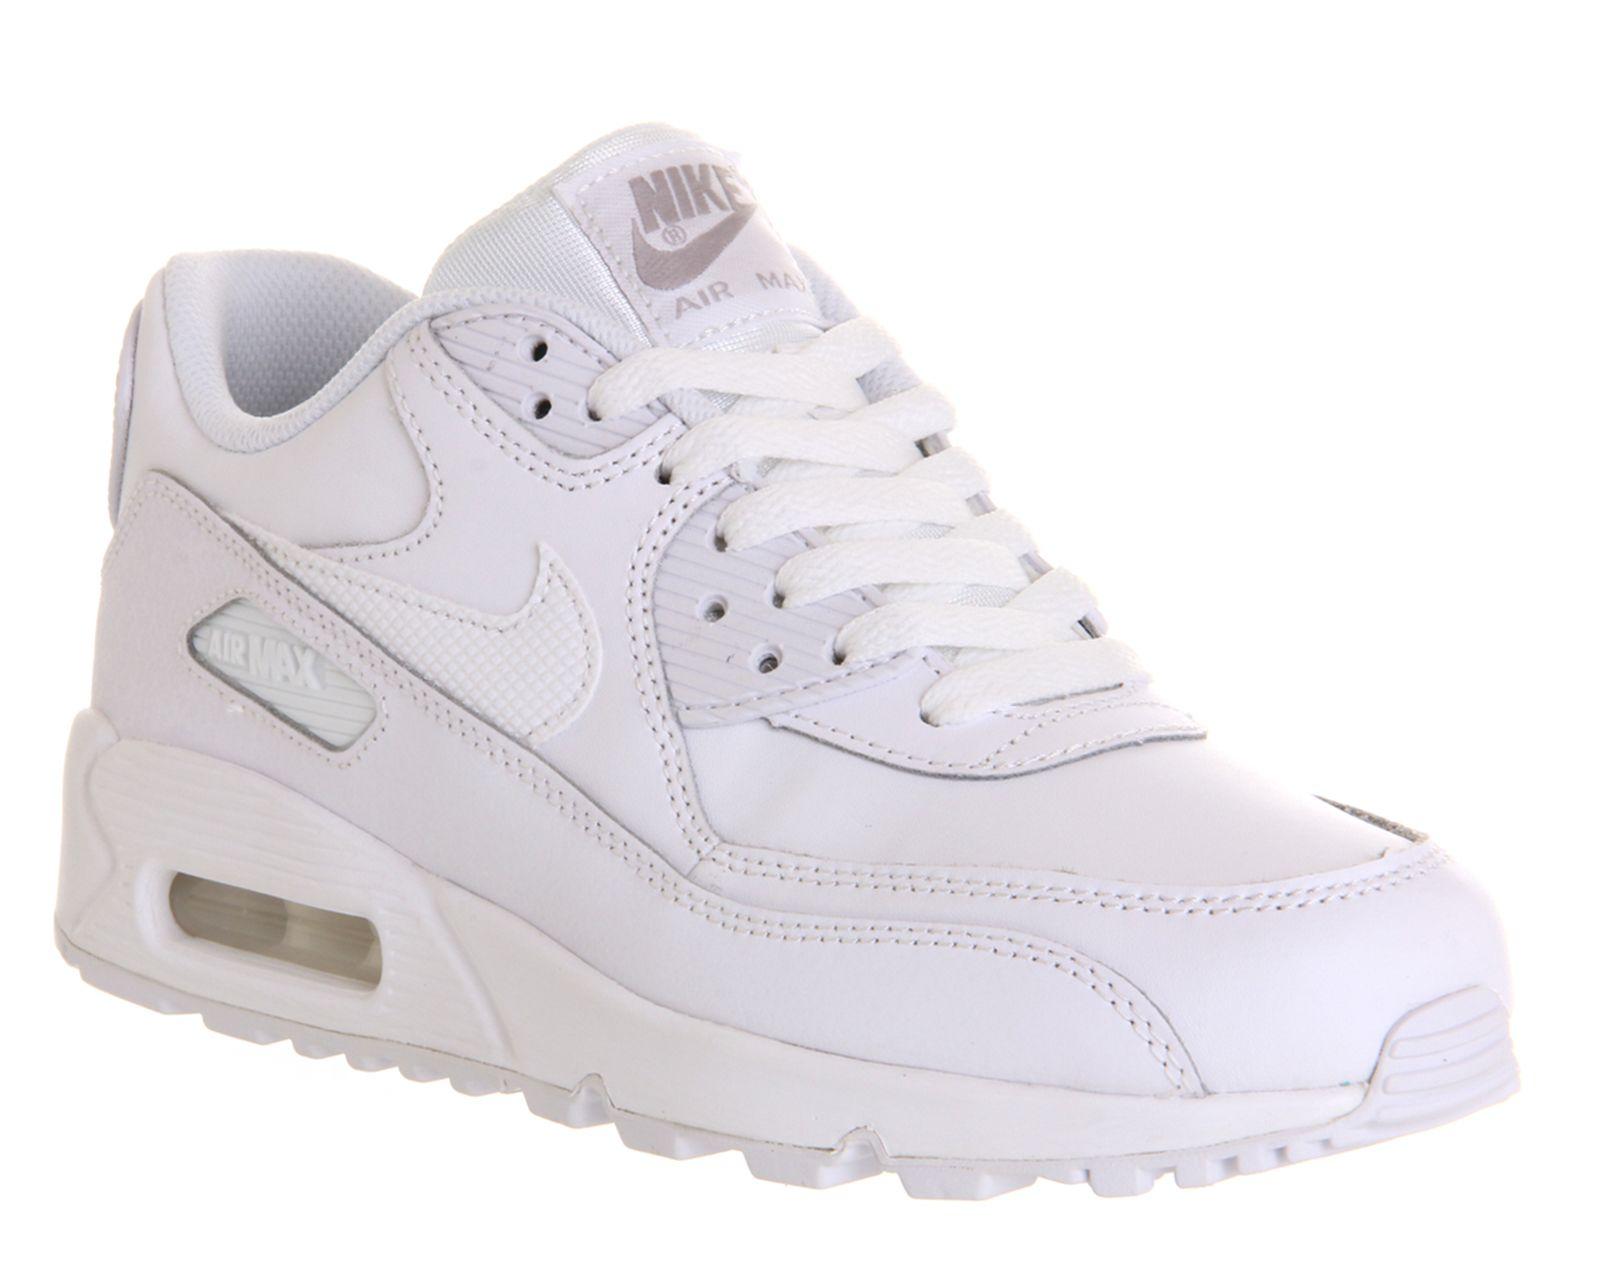 online retailer 7f39c 8704d Nike Air Max 90 Gs White Mono - Unisex